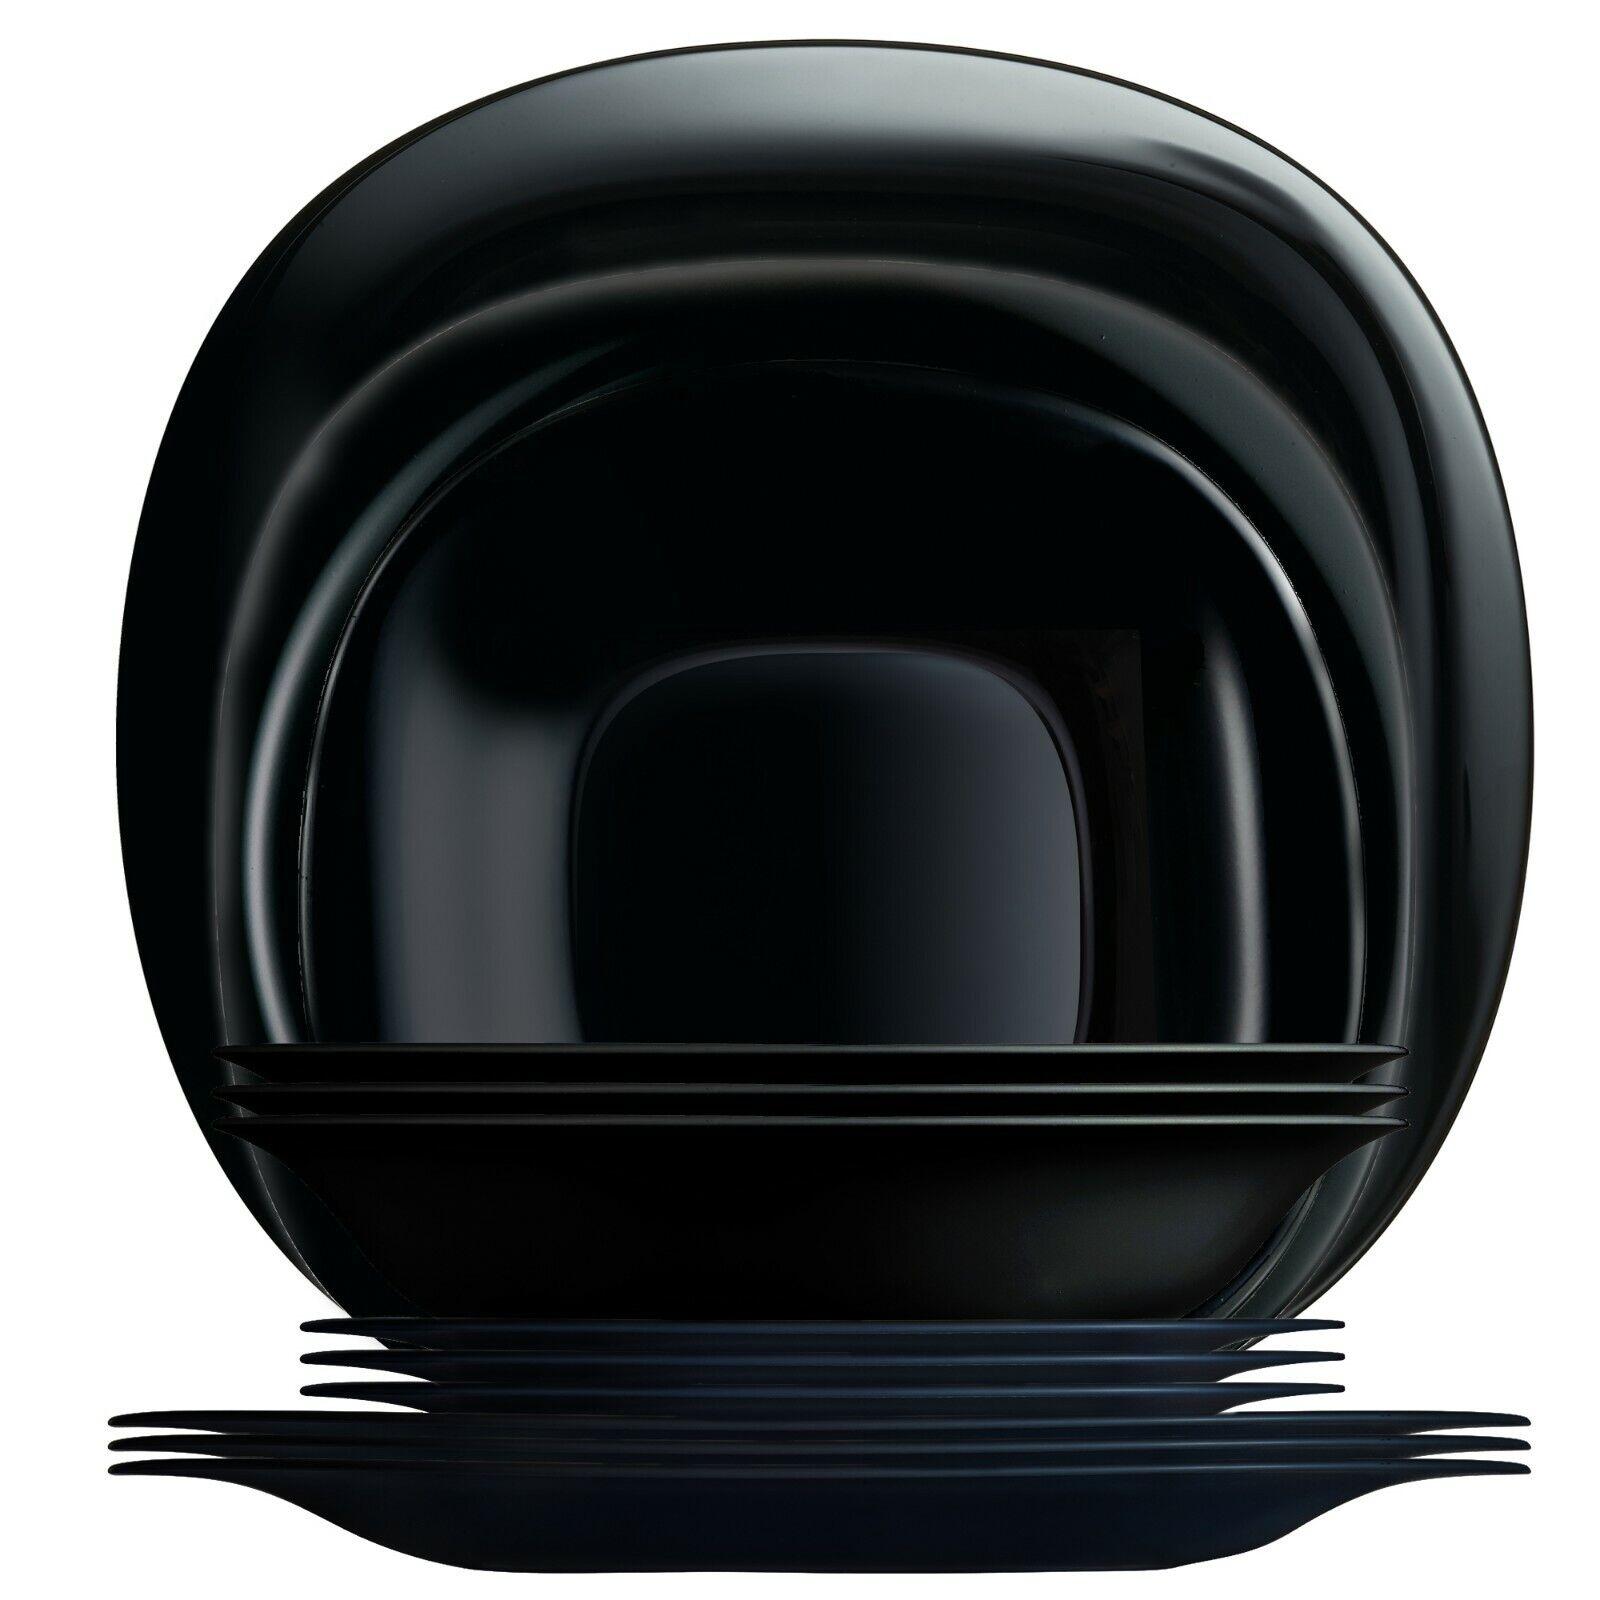 Luminarc - Carine Black Dinnerware Service for 4 - 12 PC Set